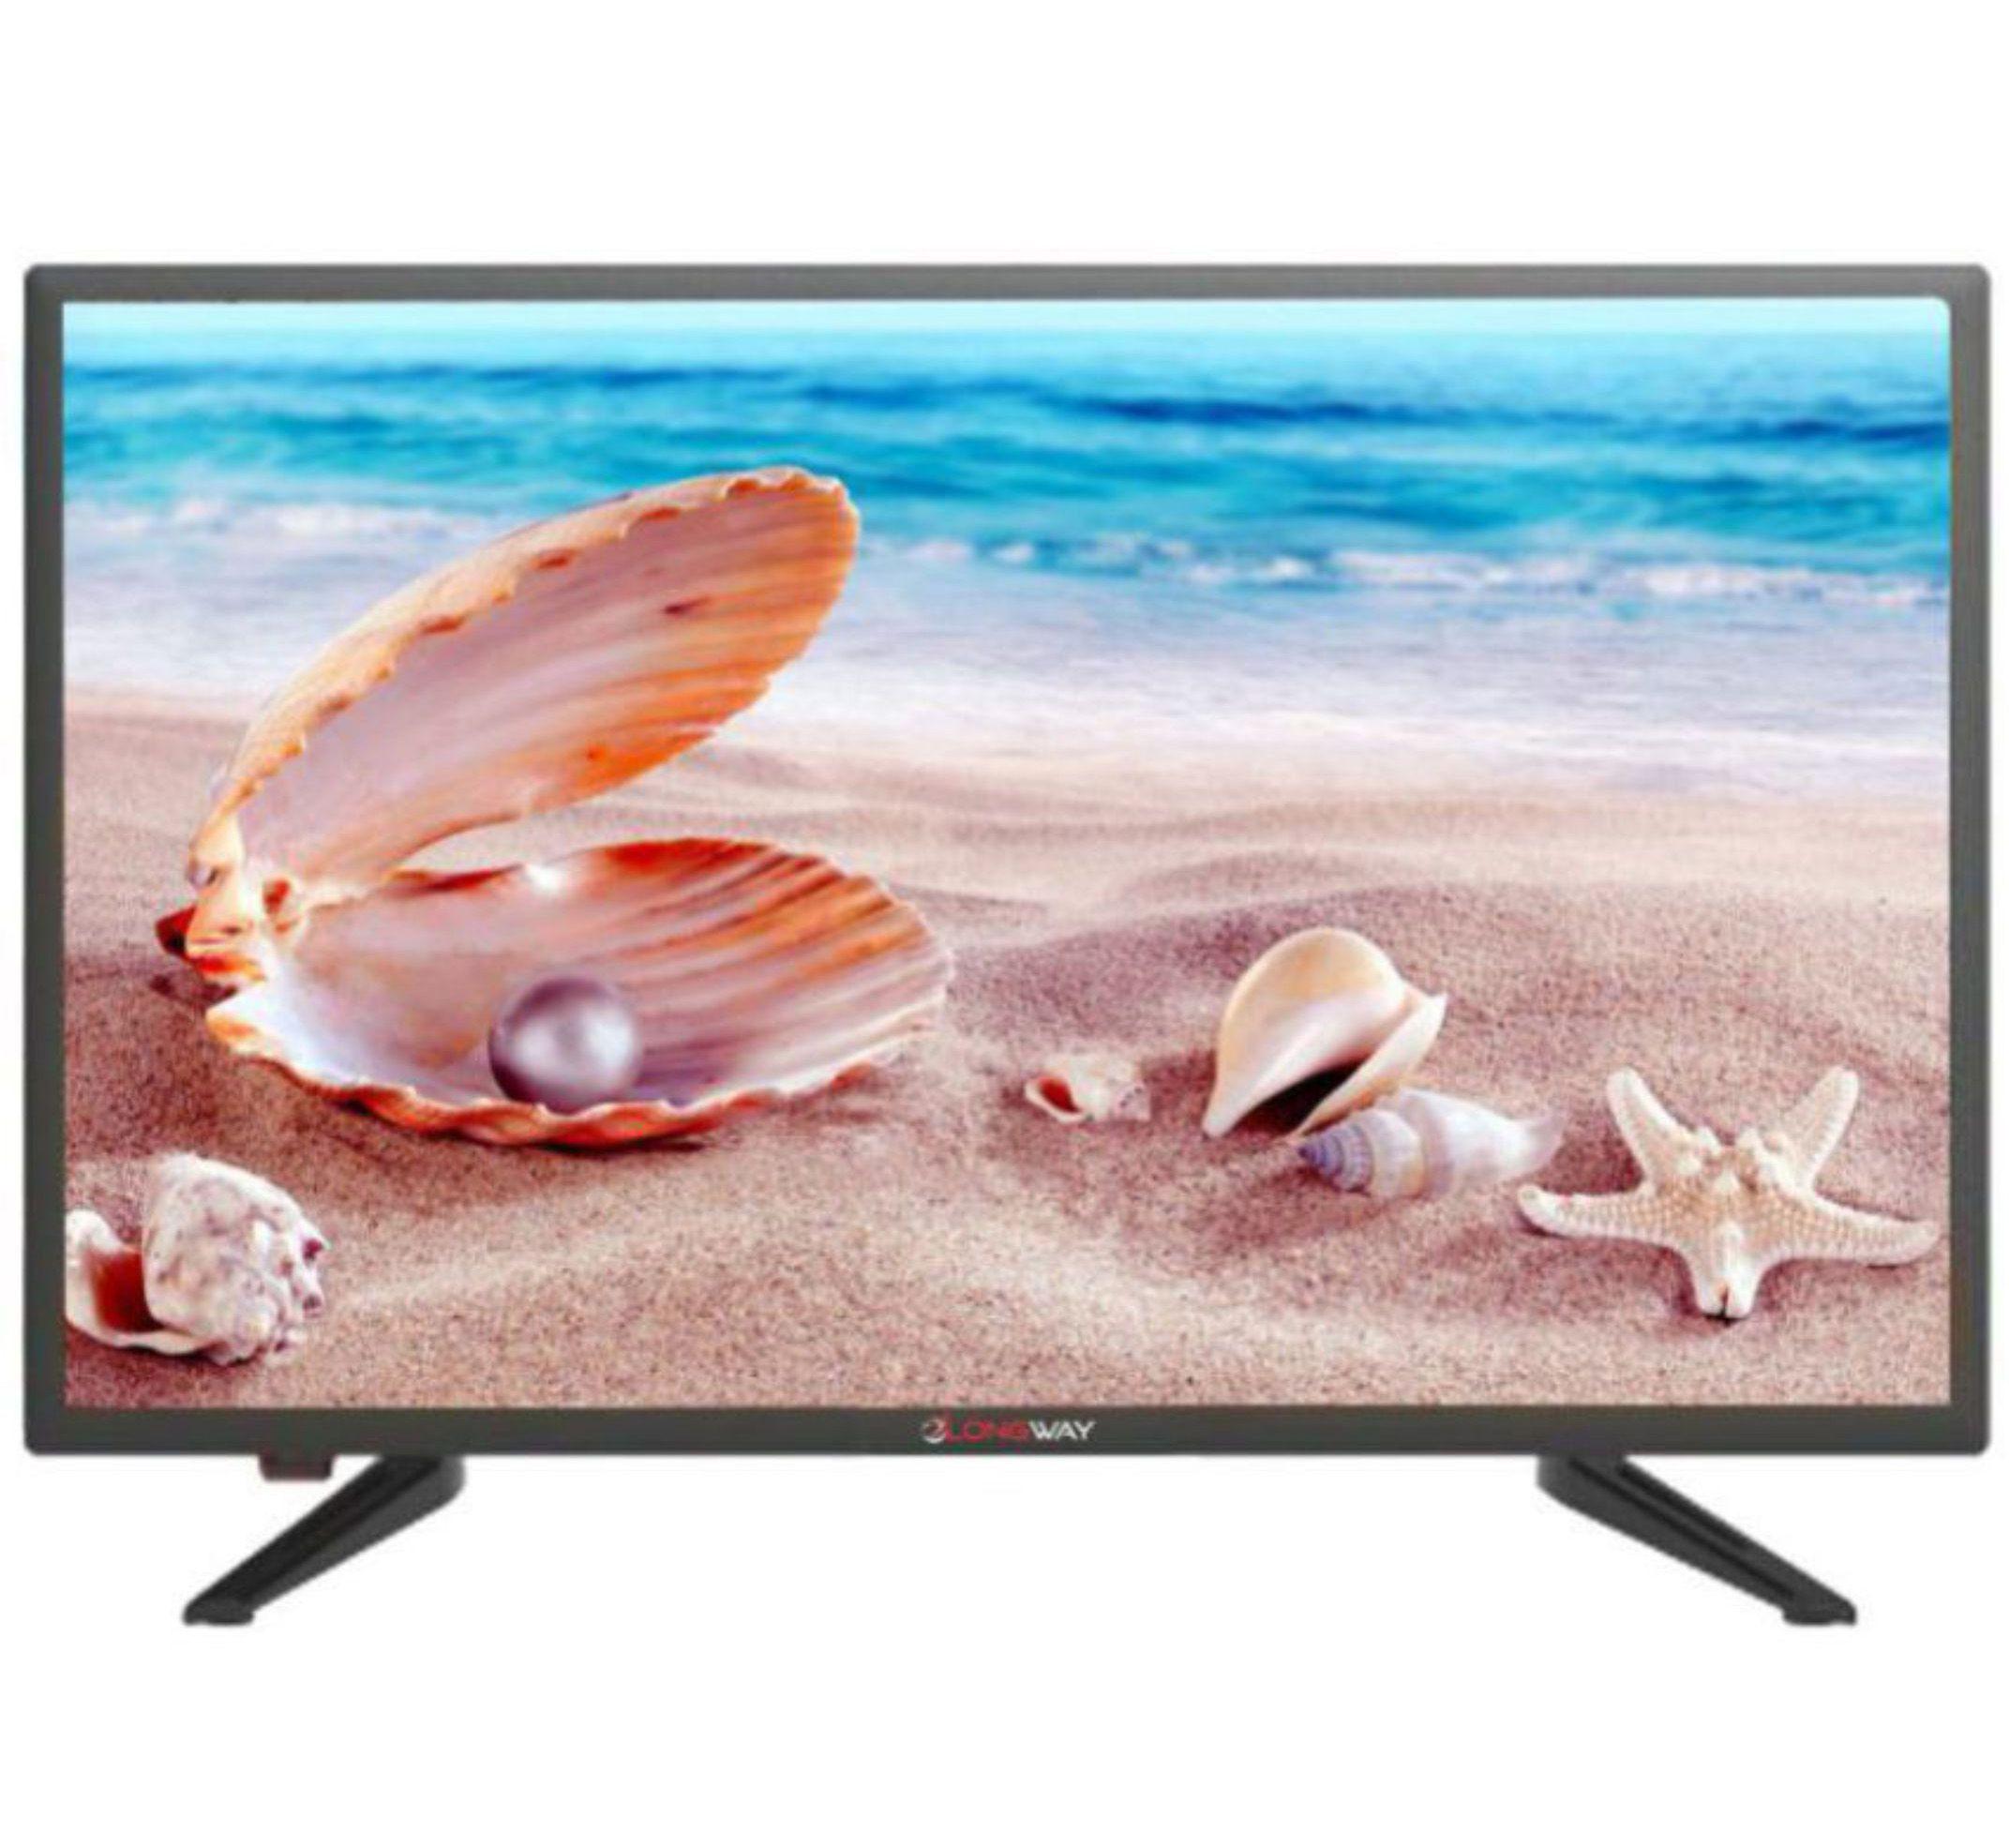 LONGWAY 24A70 (24) 60 cm Full HD (FHD) LED Television